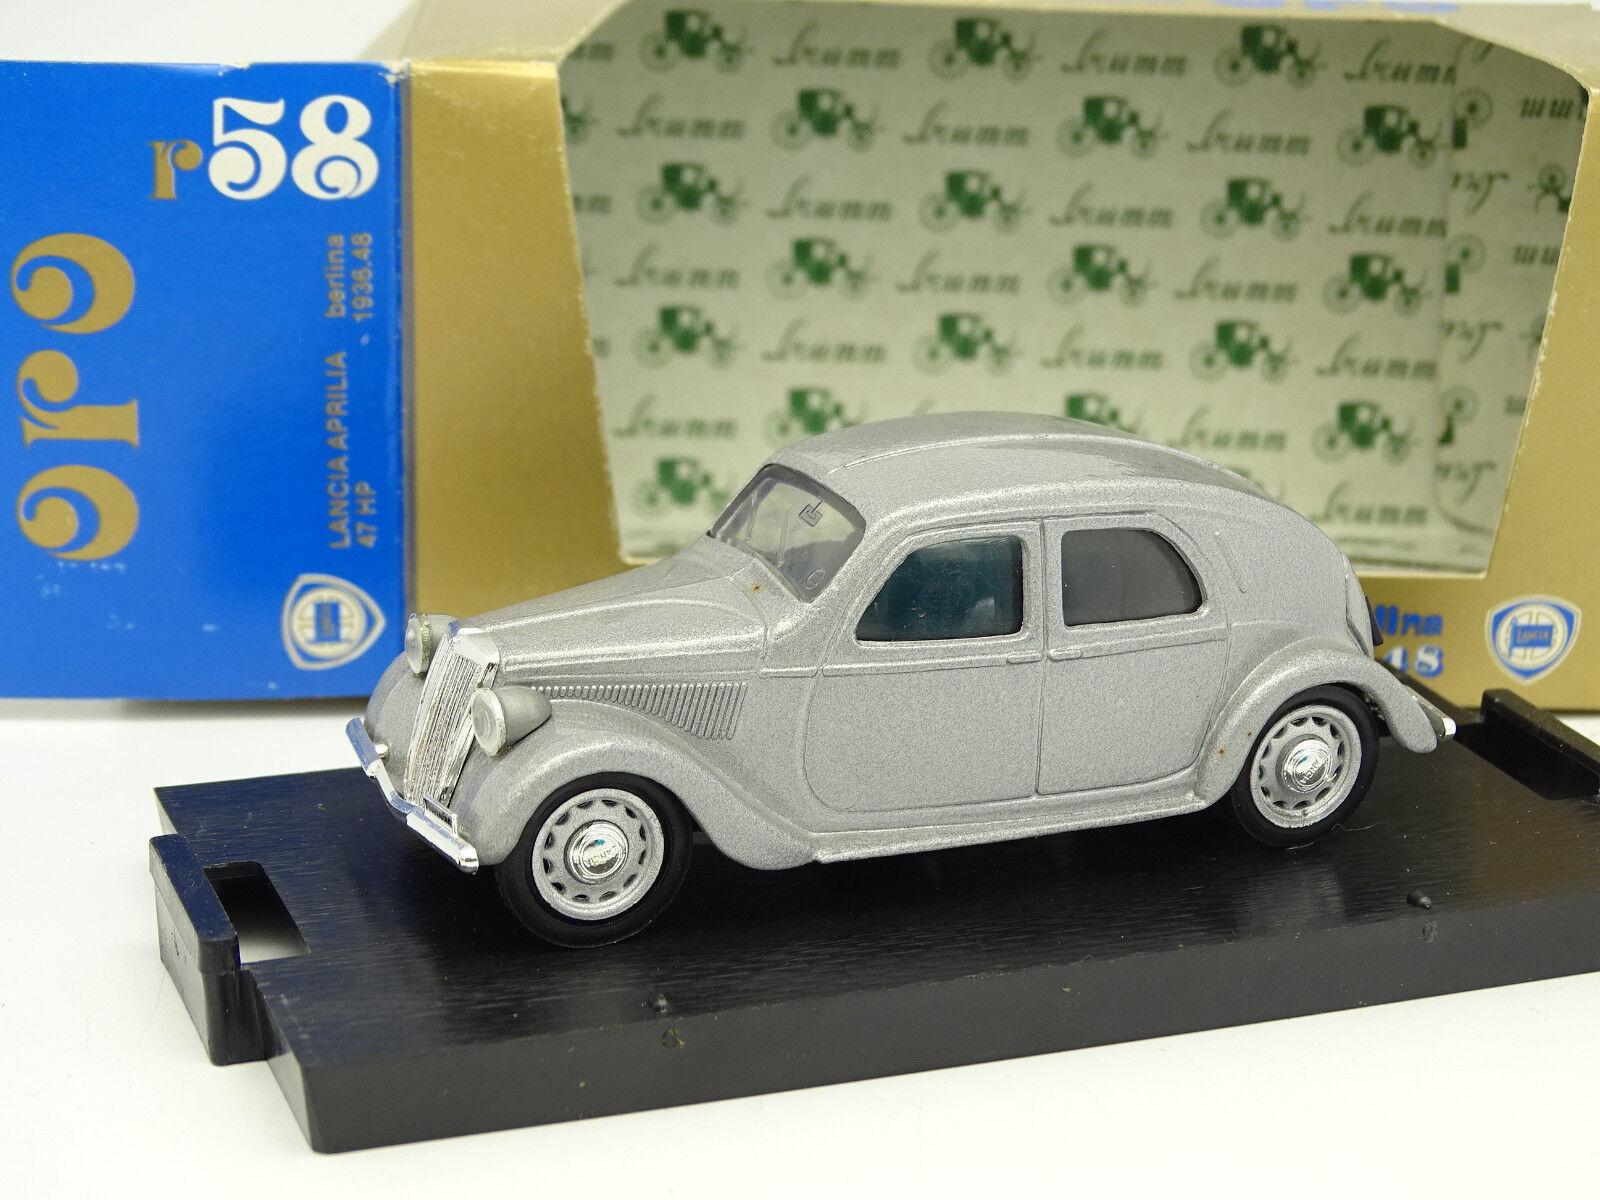 Brumm Brumm Brumm 1 43 - Lancia Aprilia 1934 silver 0ec5a0